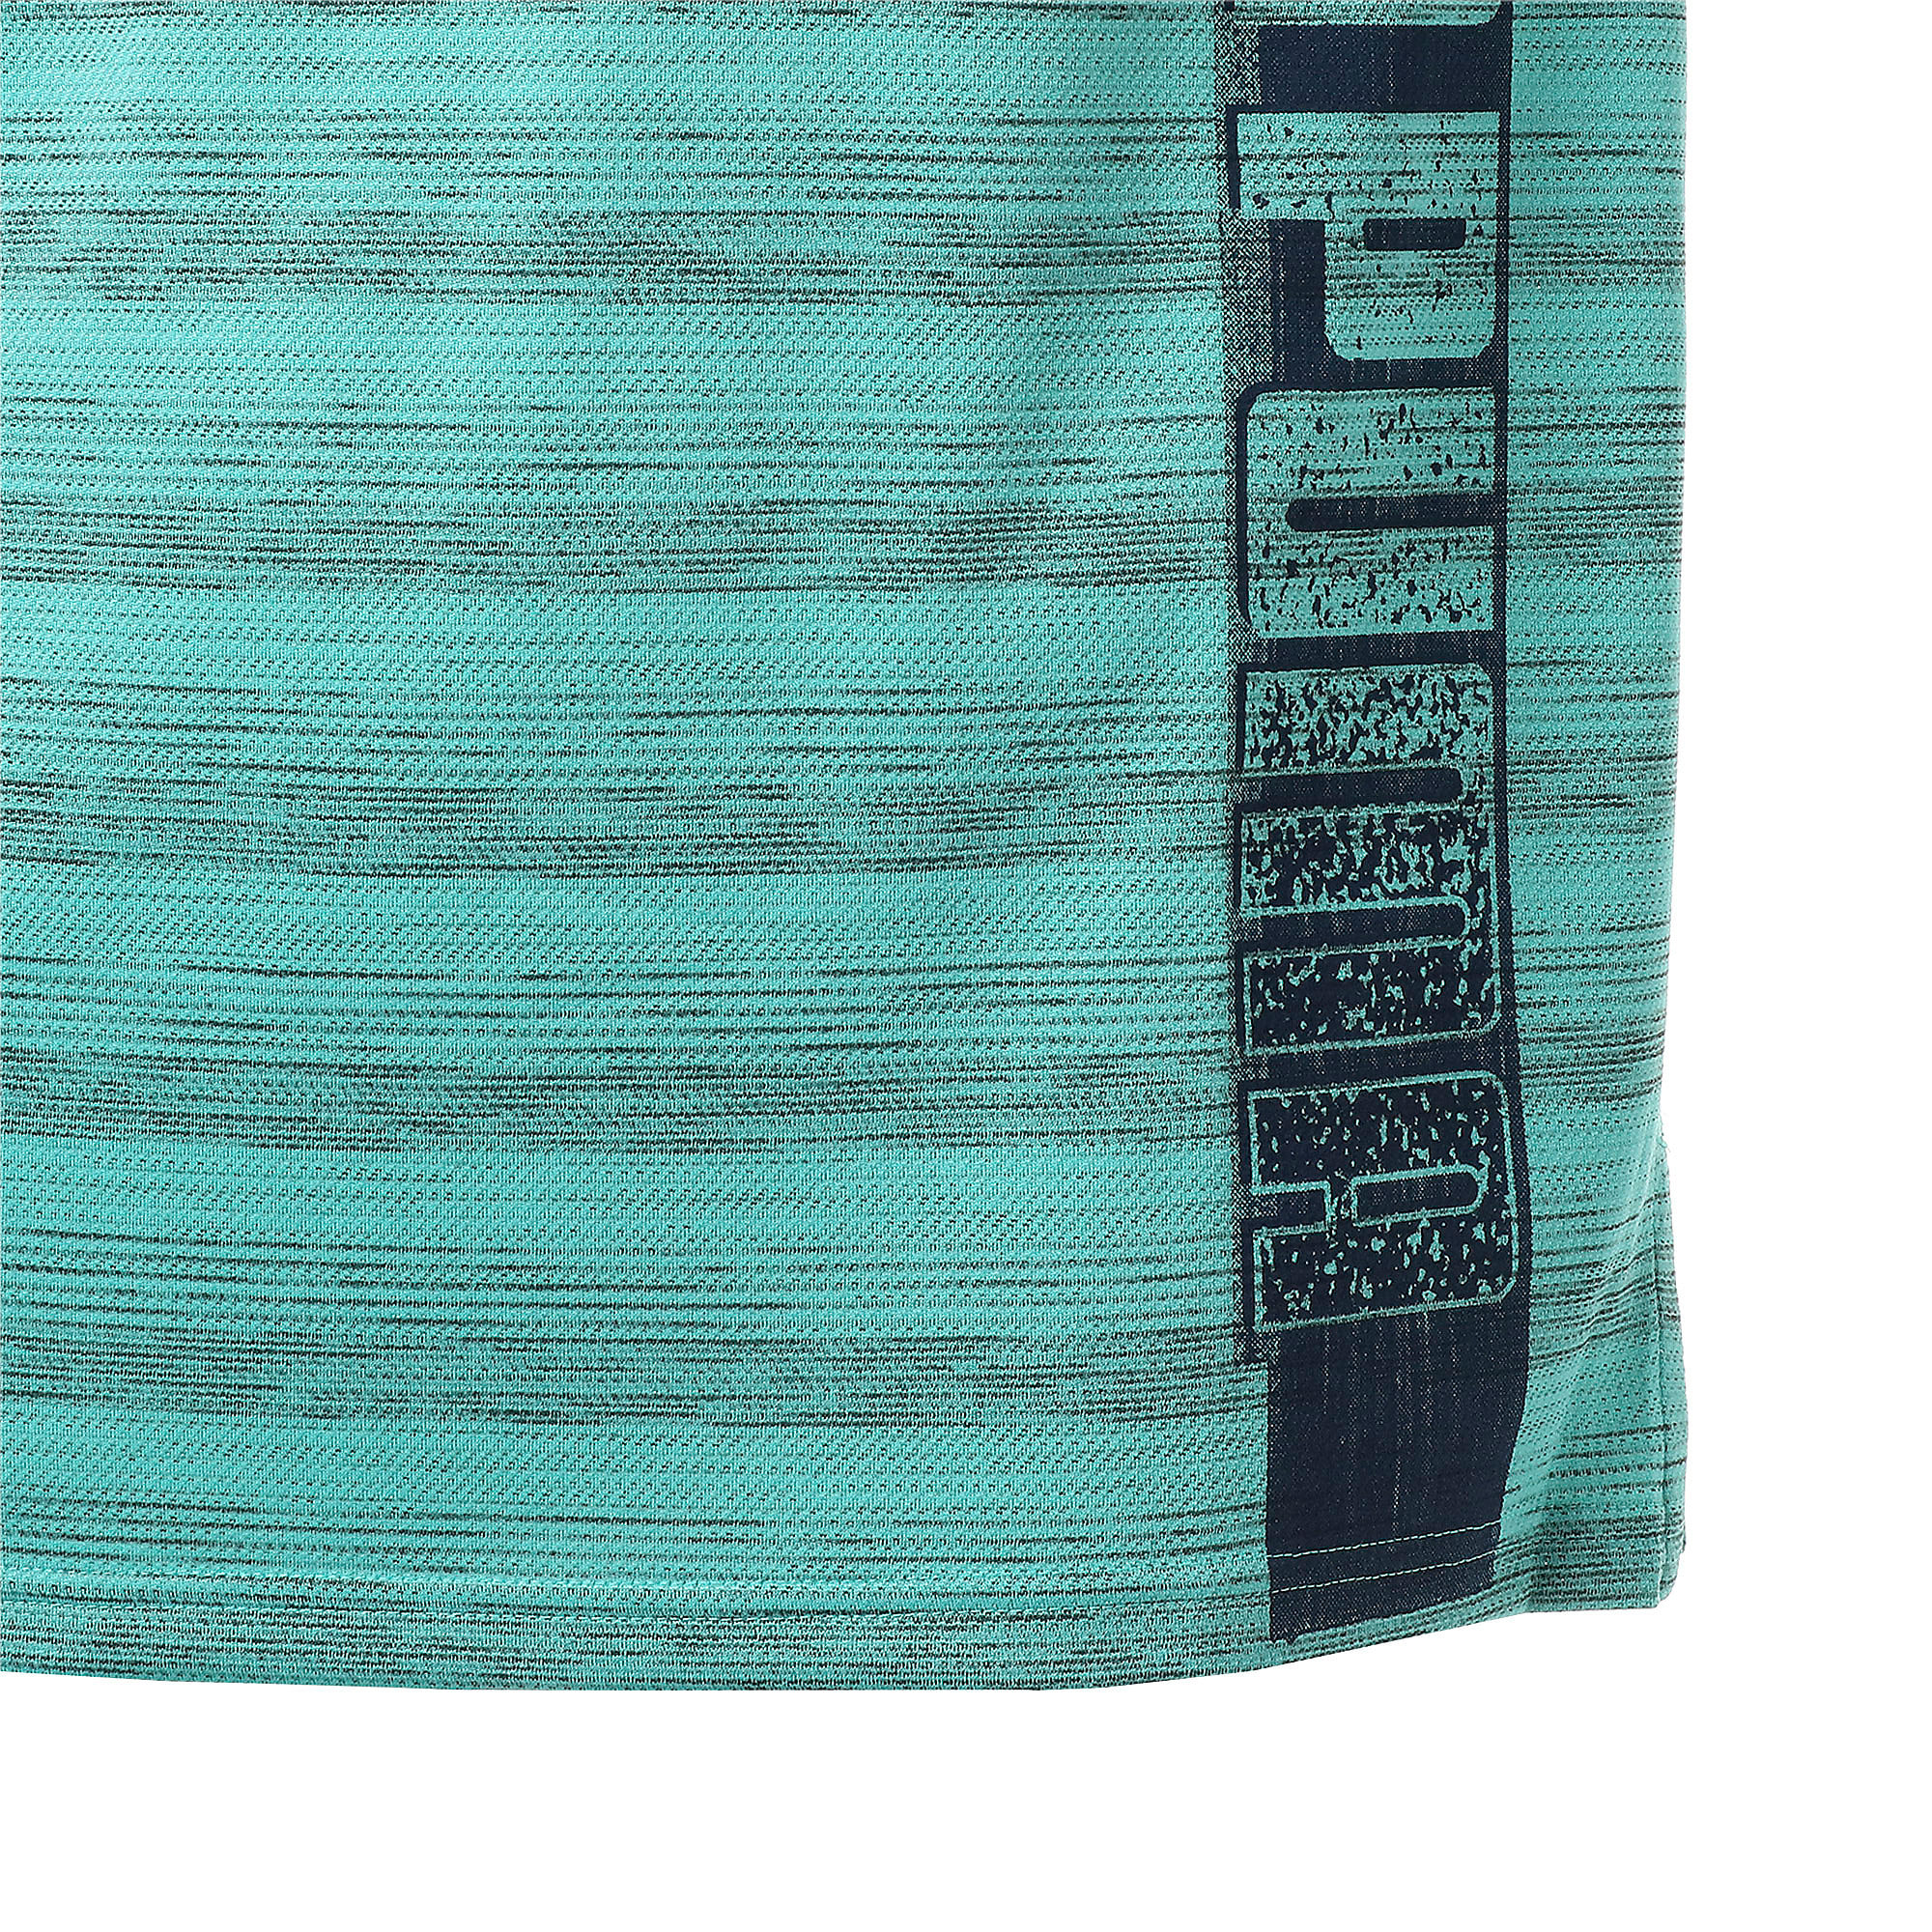 Thumbnail 9 of LAST LAP ヘザー SS ランニング Tシャツ 半袖, Blue Turquoise Heather, medium-JPN